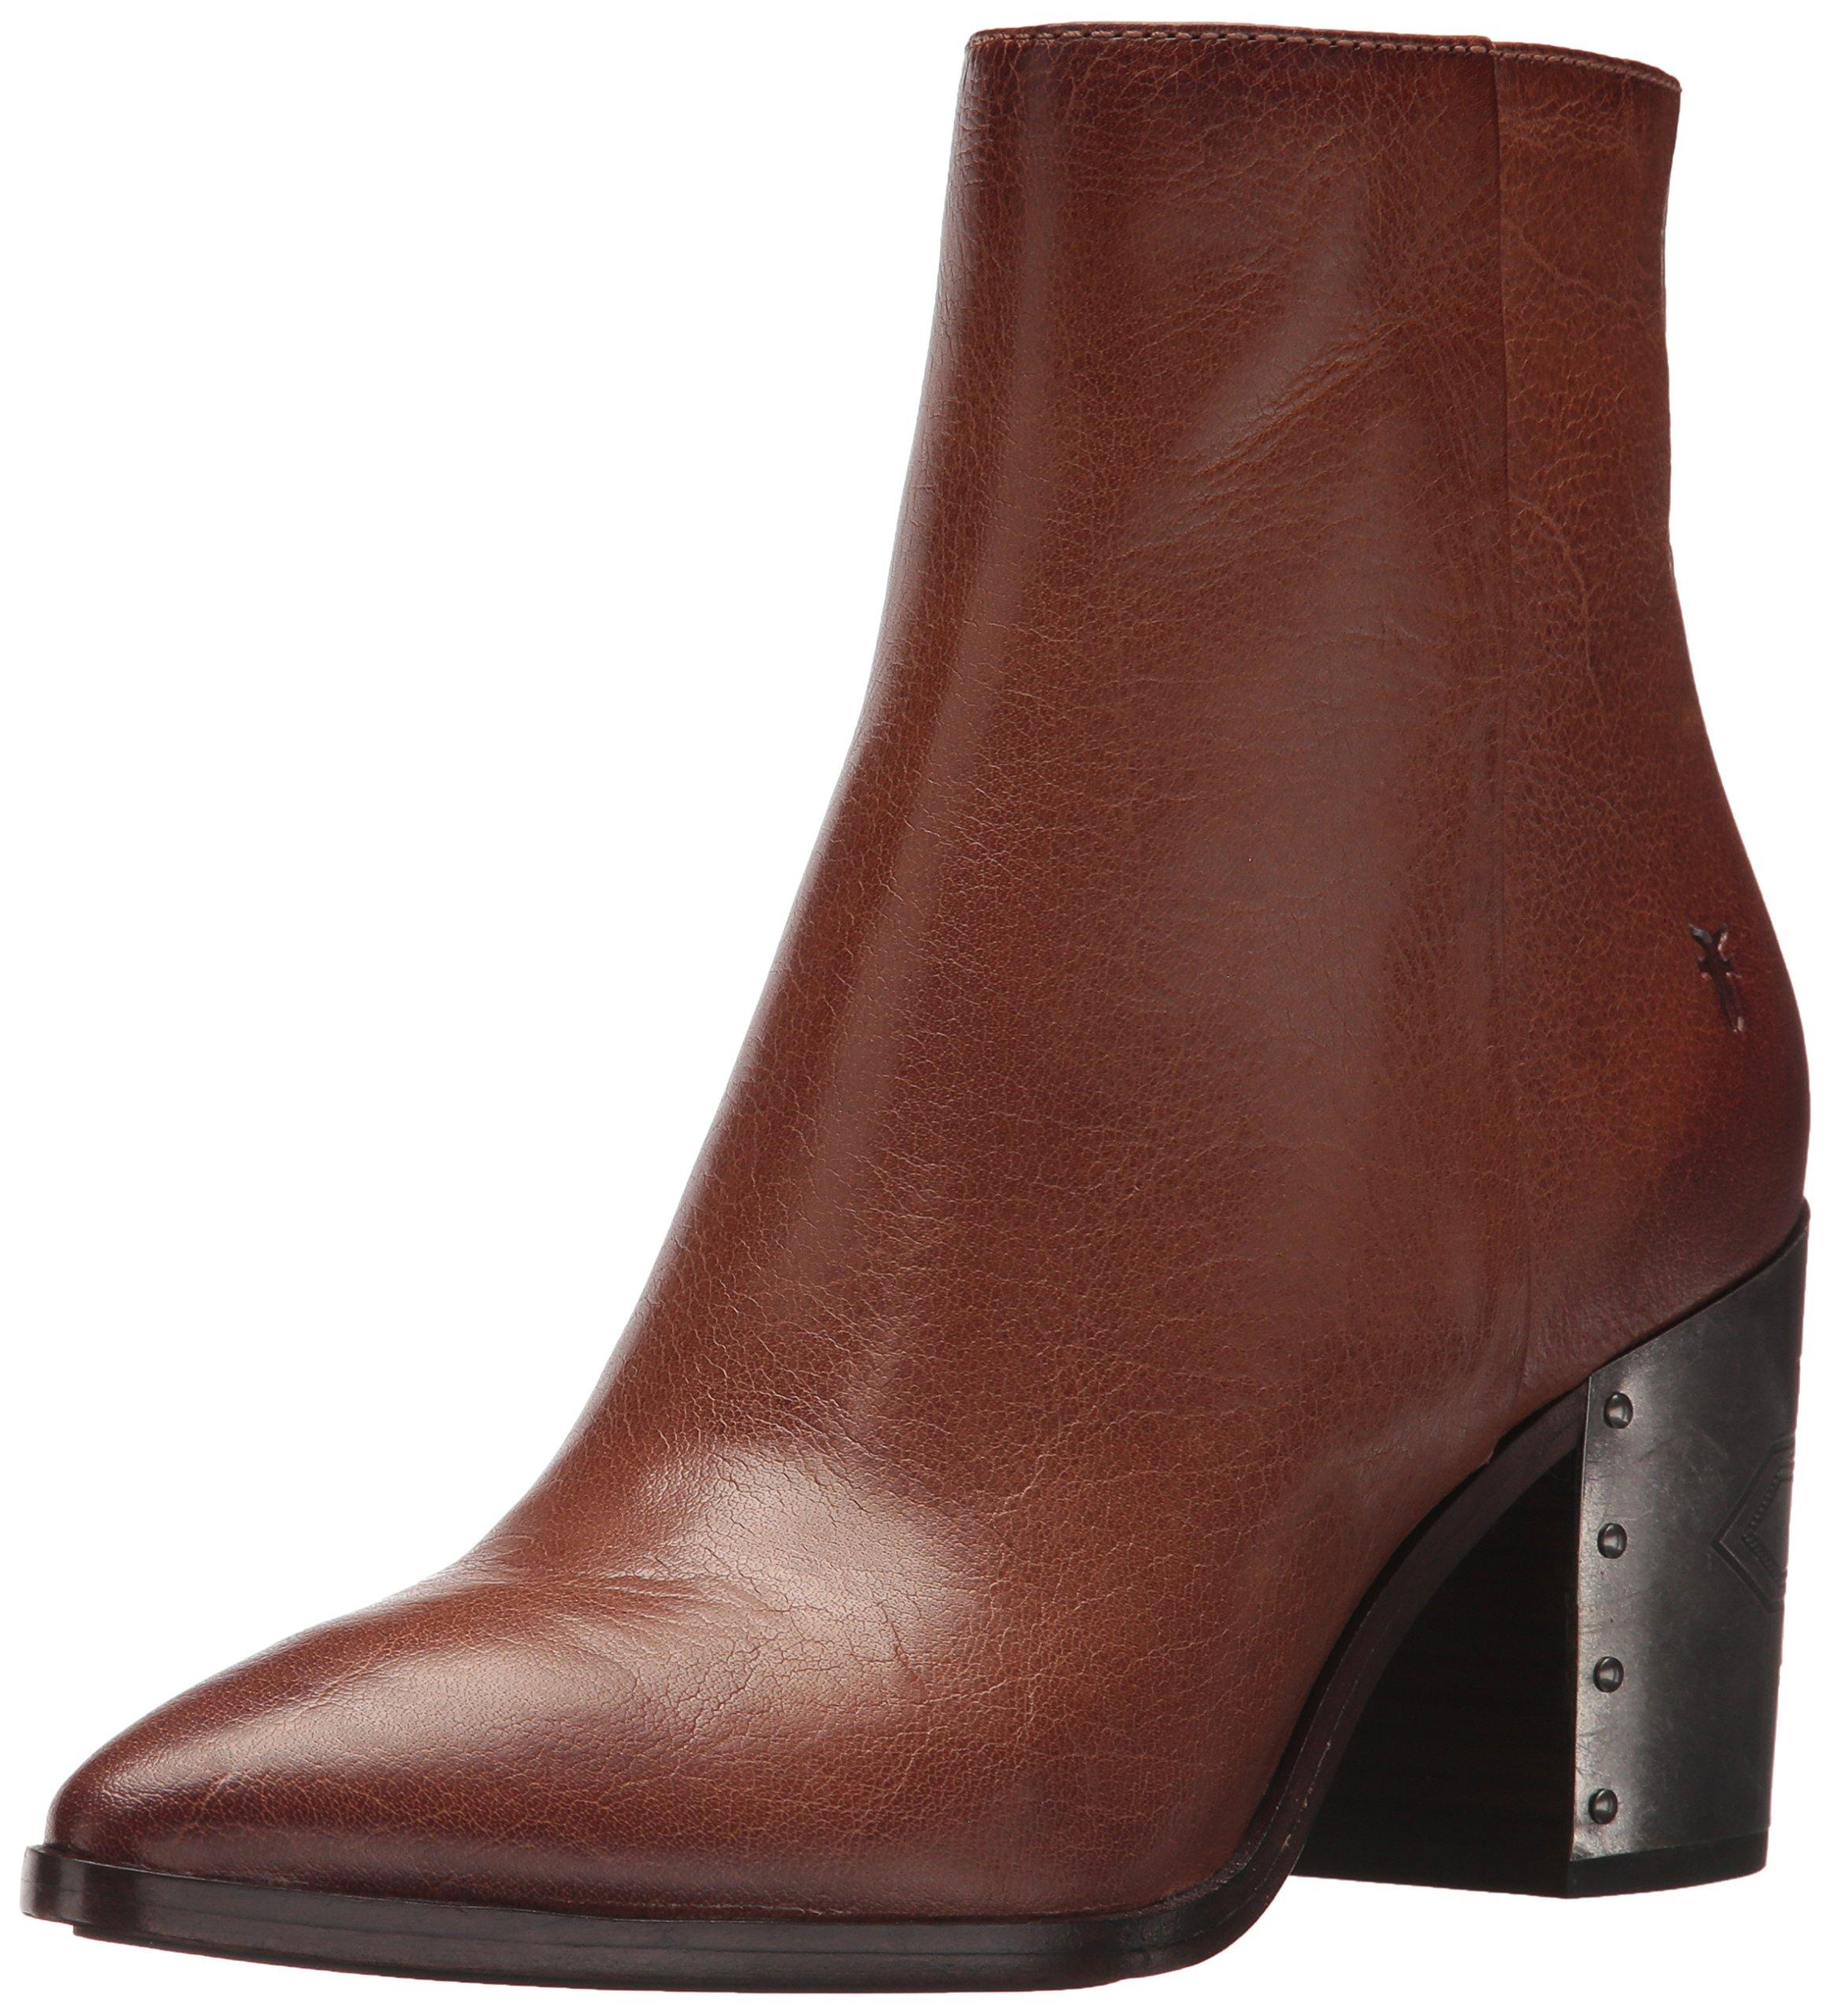 FRYE Women's Flynn Omaja Short Inside Zip Ankle Boot, Cognac, 8.5 M US